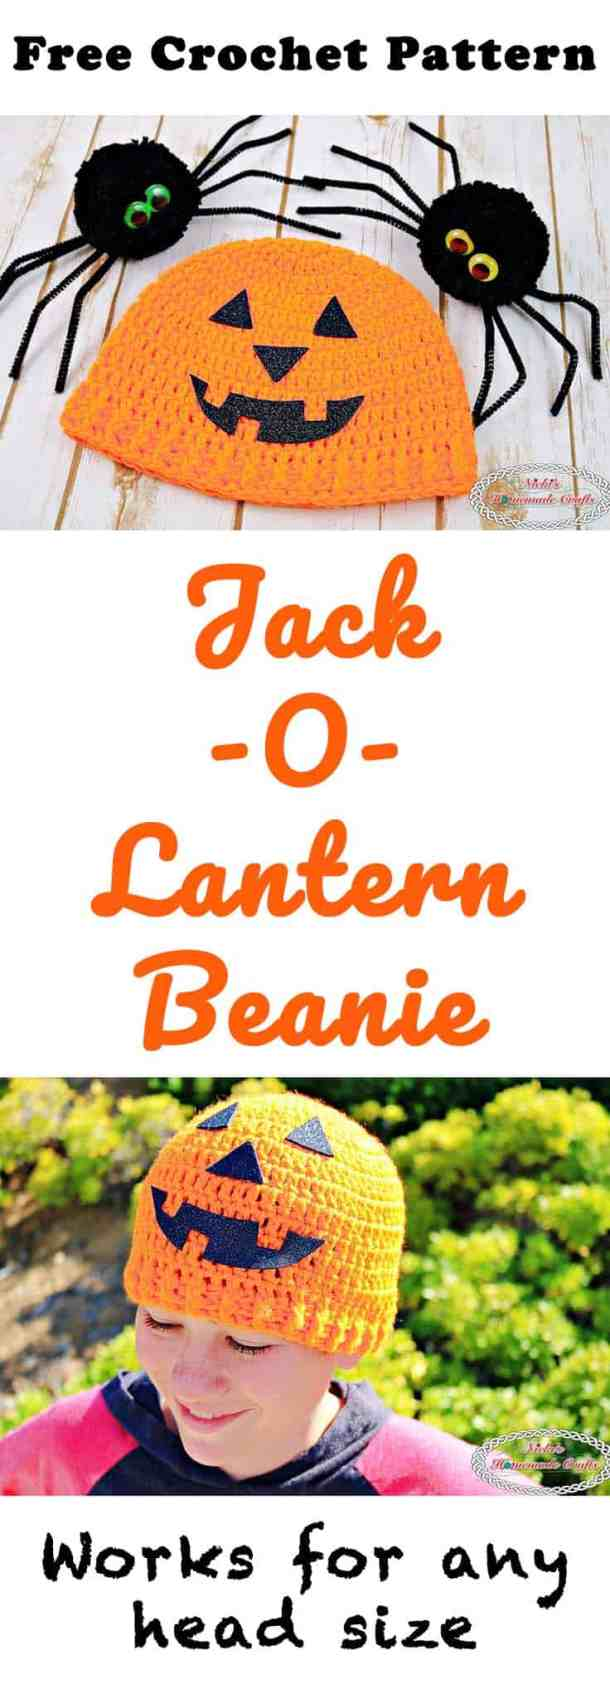 Jack-O-Lantern Beanie -Free Crochet Pattern by Nicki's Homemade Crafts #crochet #halloween #beanie #hat #jackolantern #pumpkin